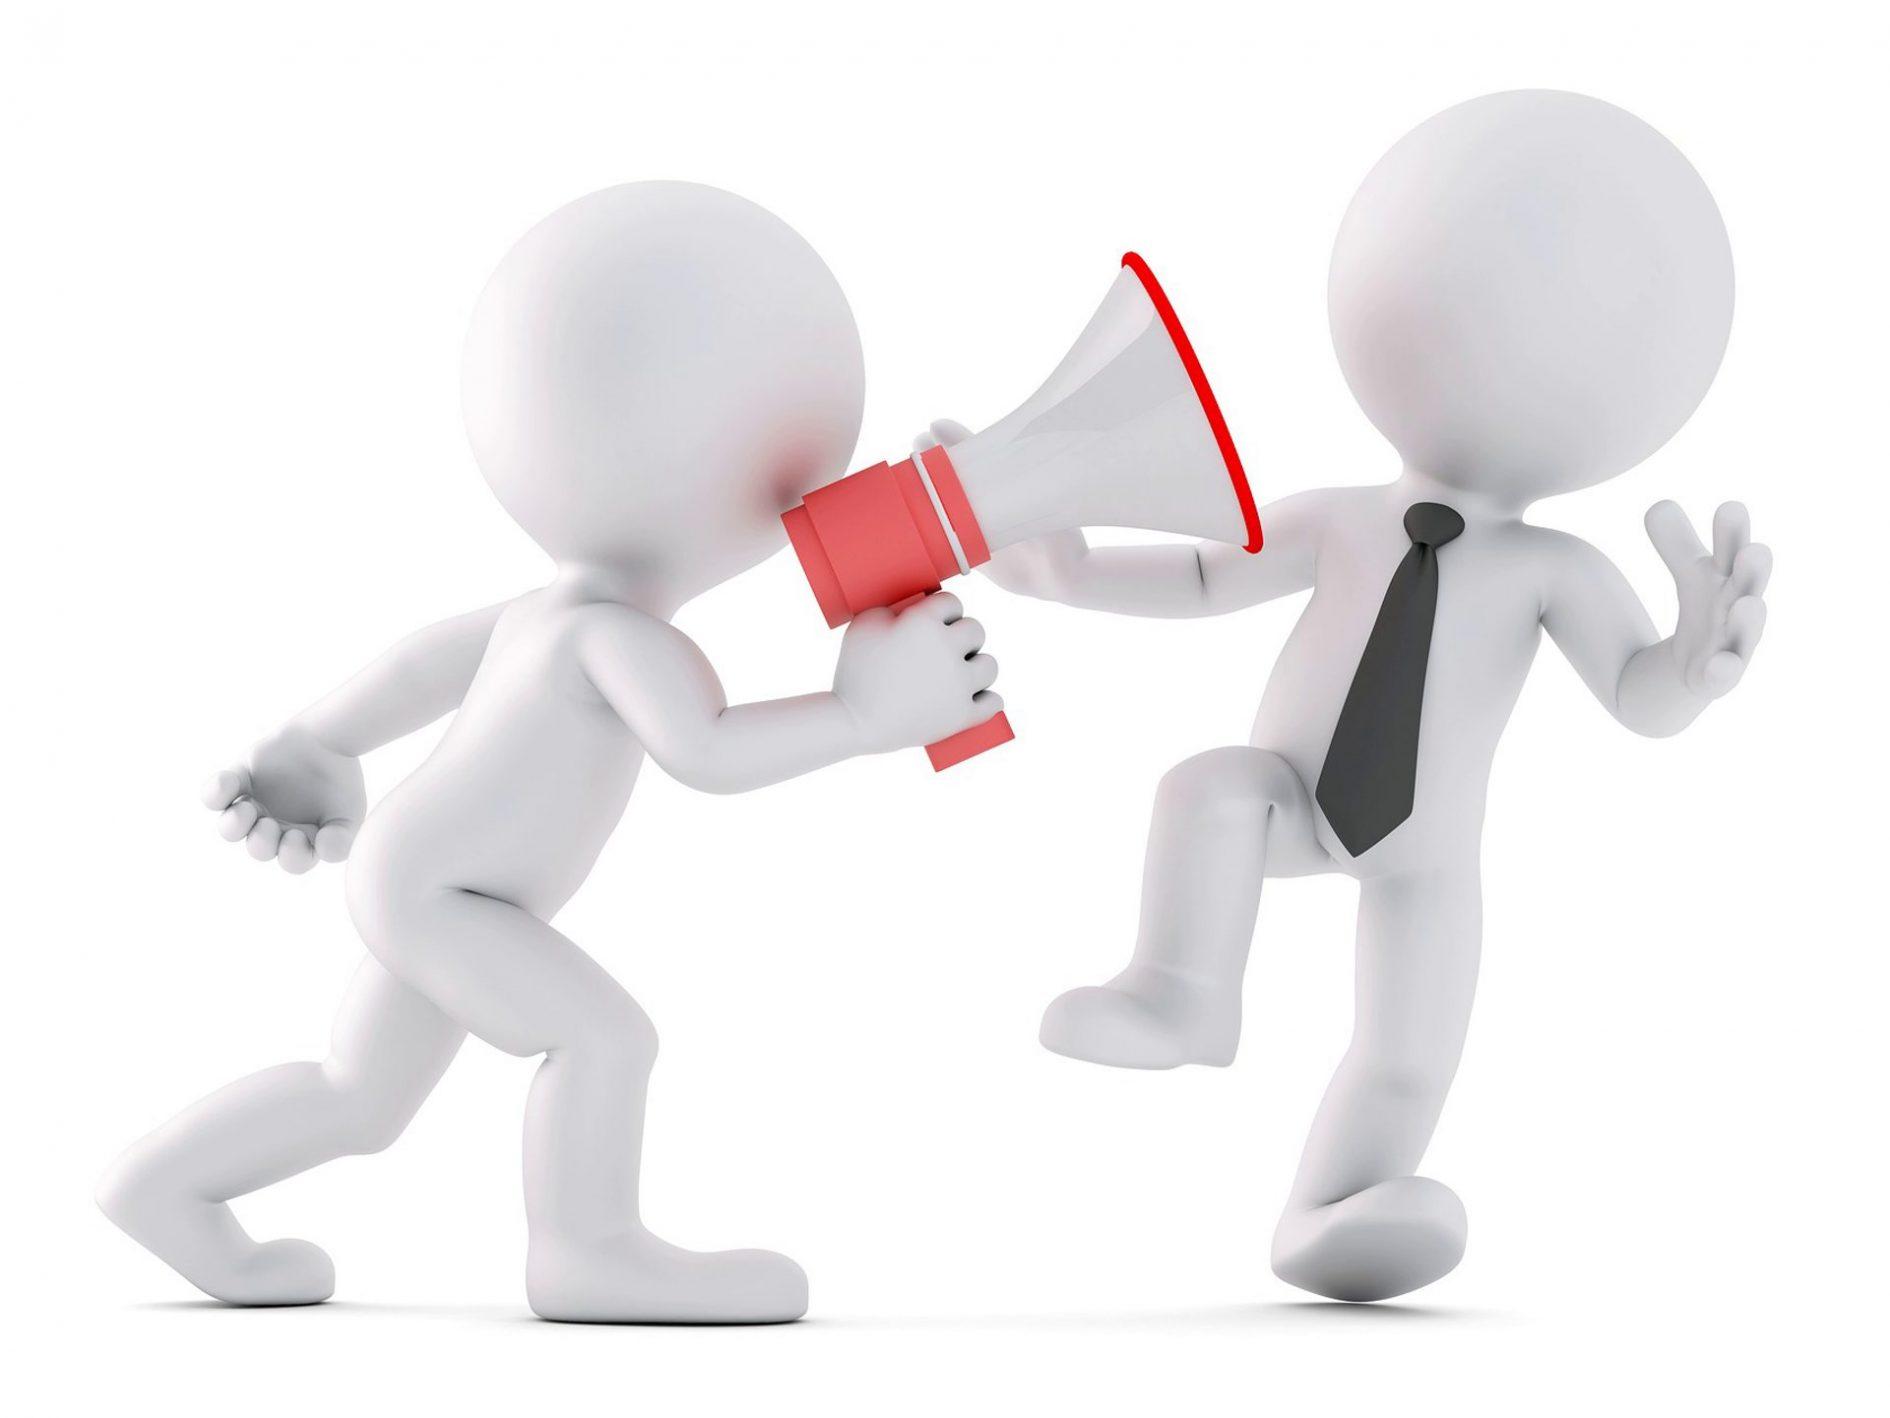 leden werkgroep communicatie